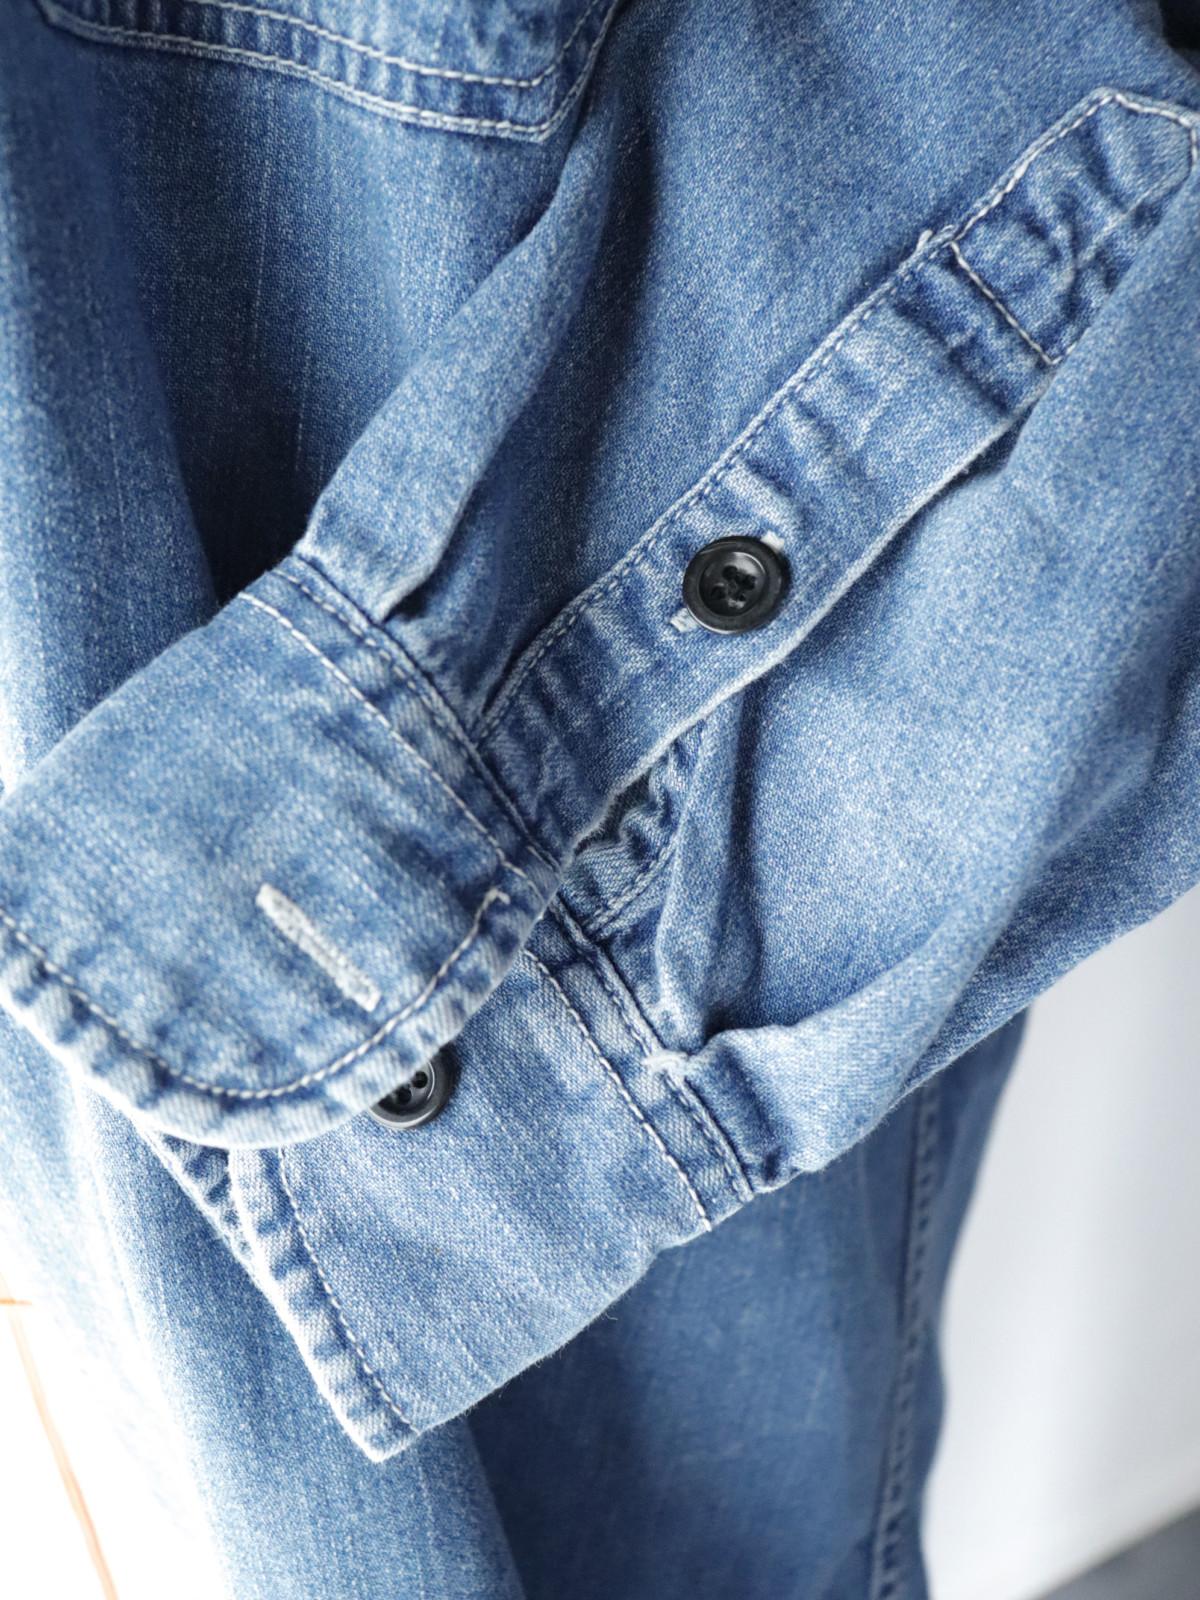 DKNY , denim jacket, USA